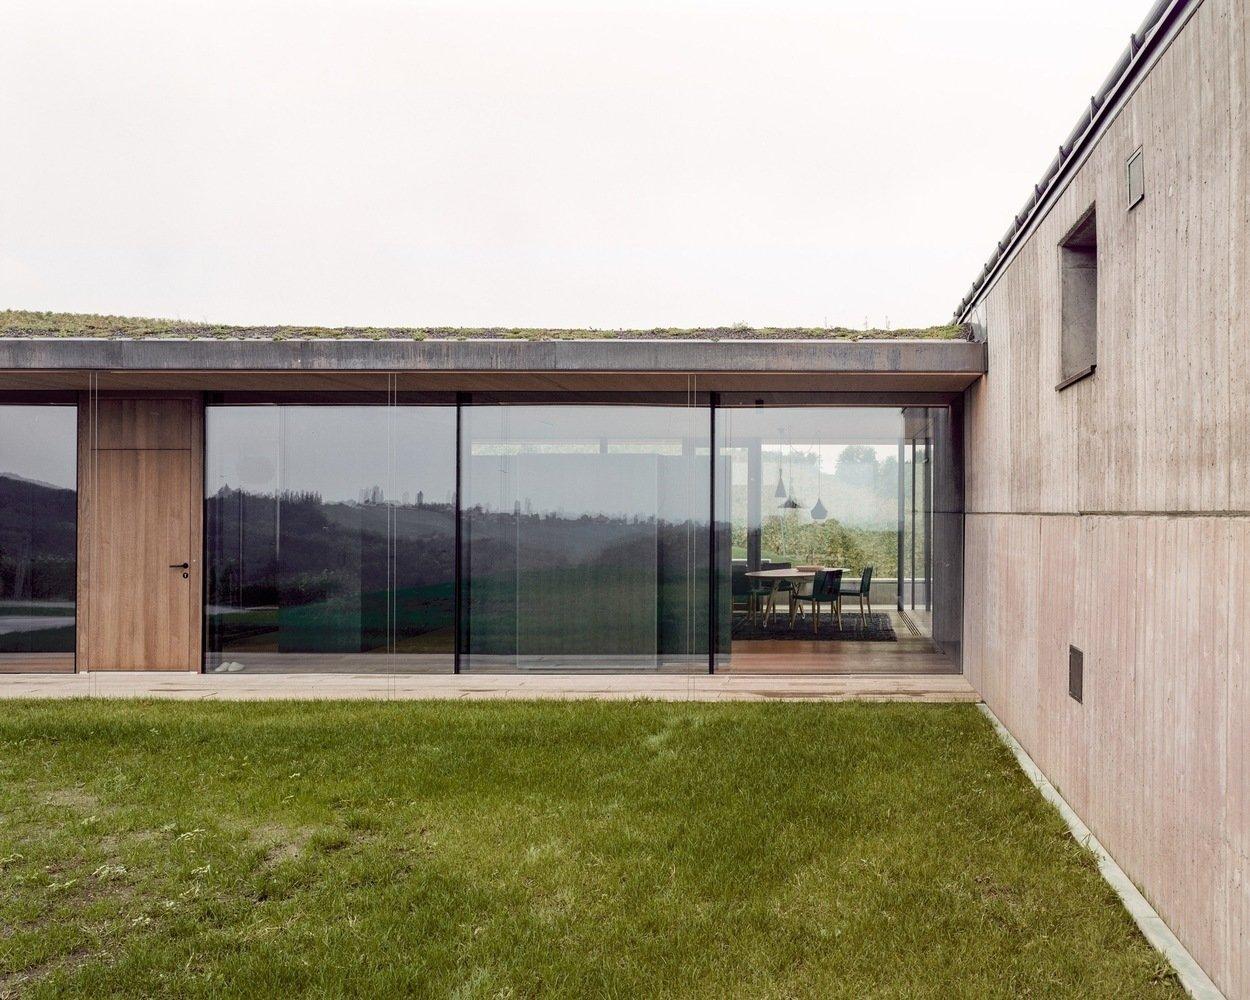 Photo 4 of 7 in House T by Atelier Ulrike Tinnacher